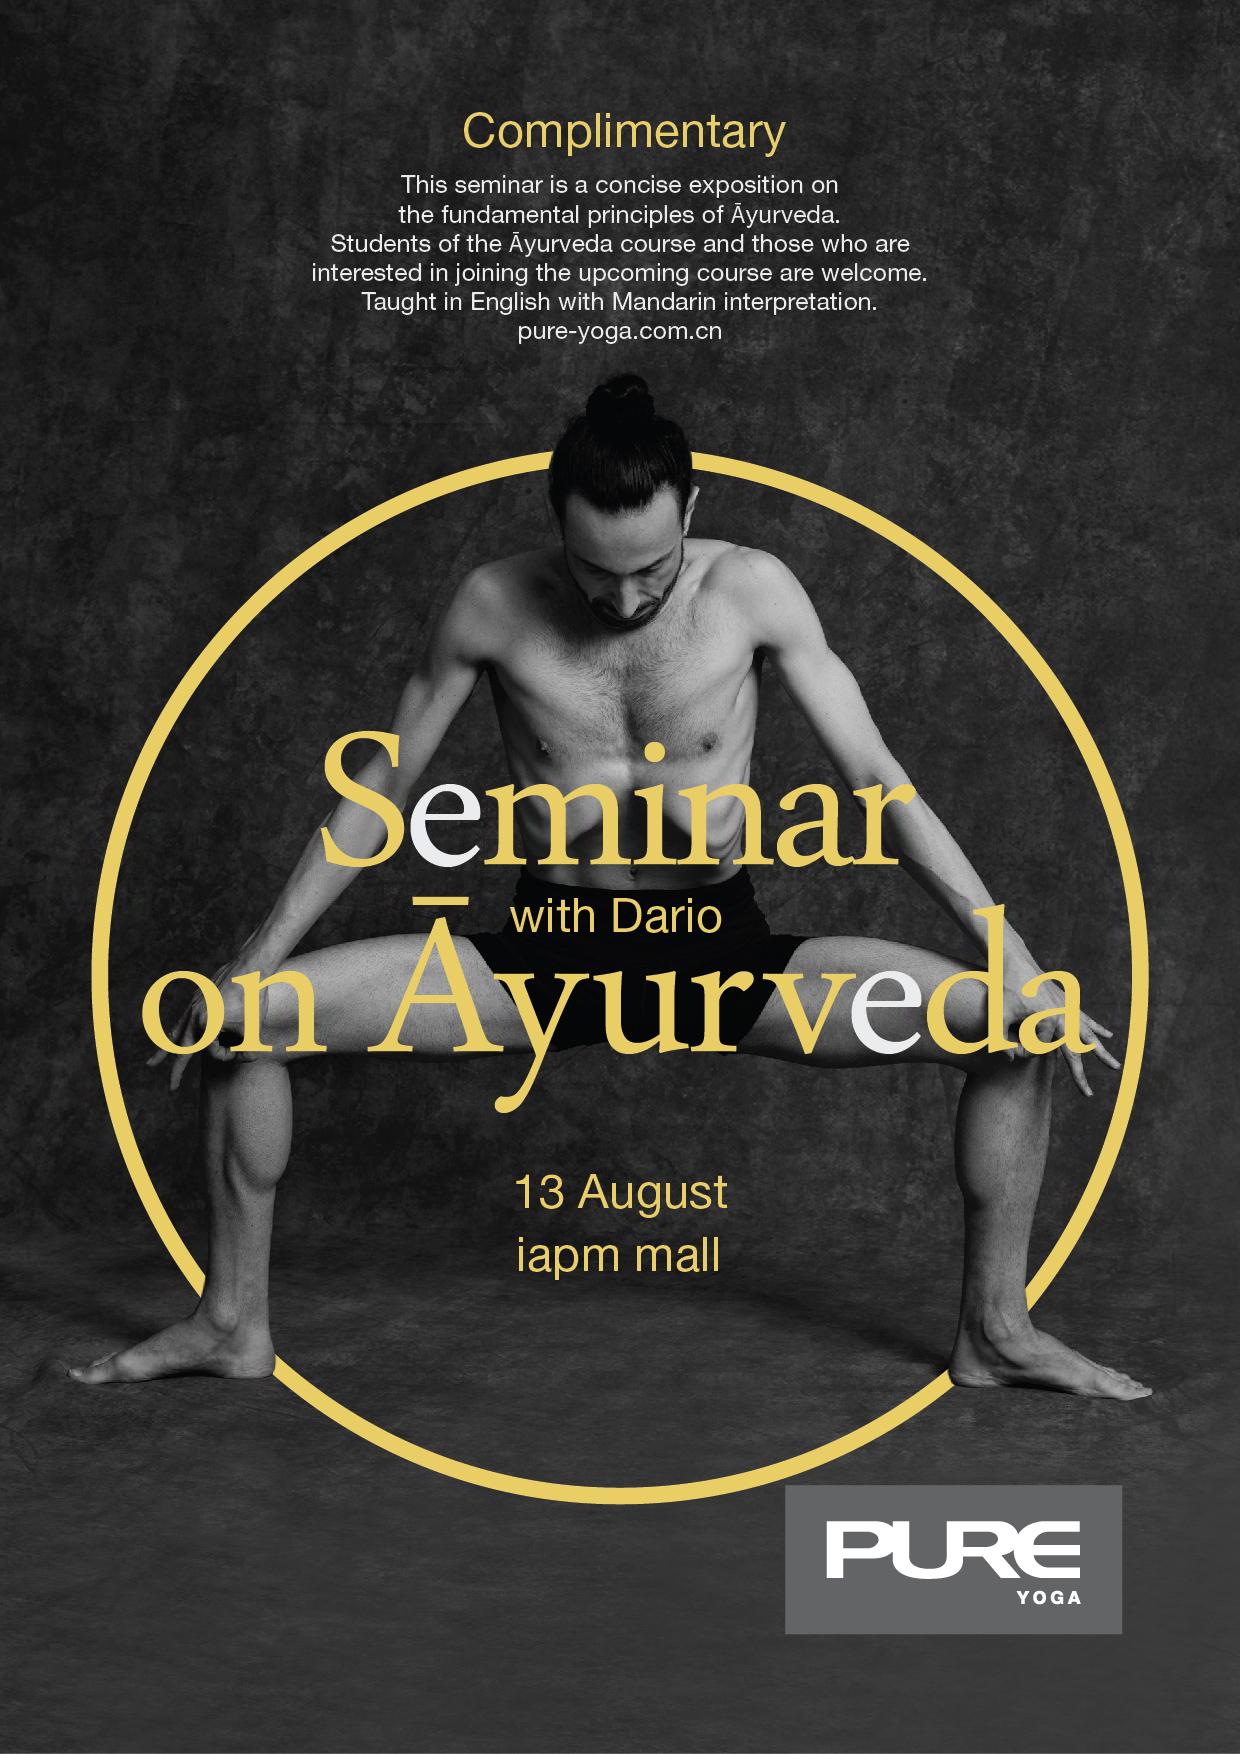 A4_Poster_14009 Seminar On Āyurveda_v2-01-2